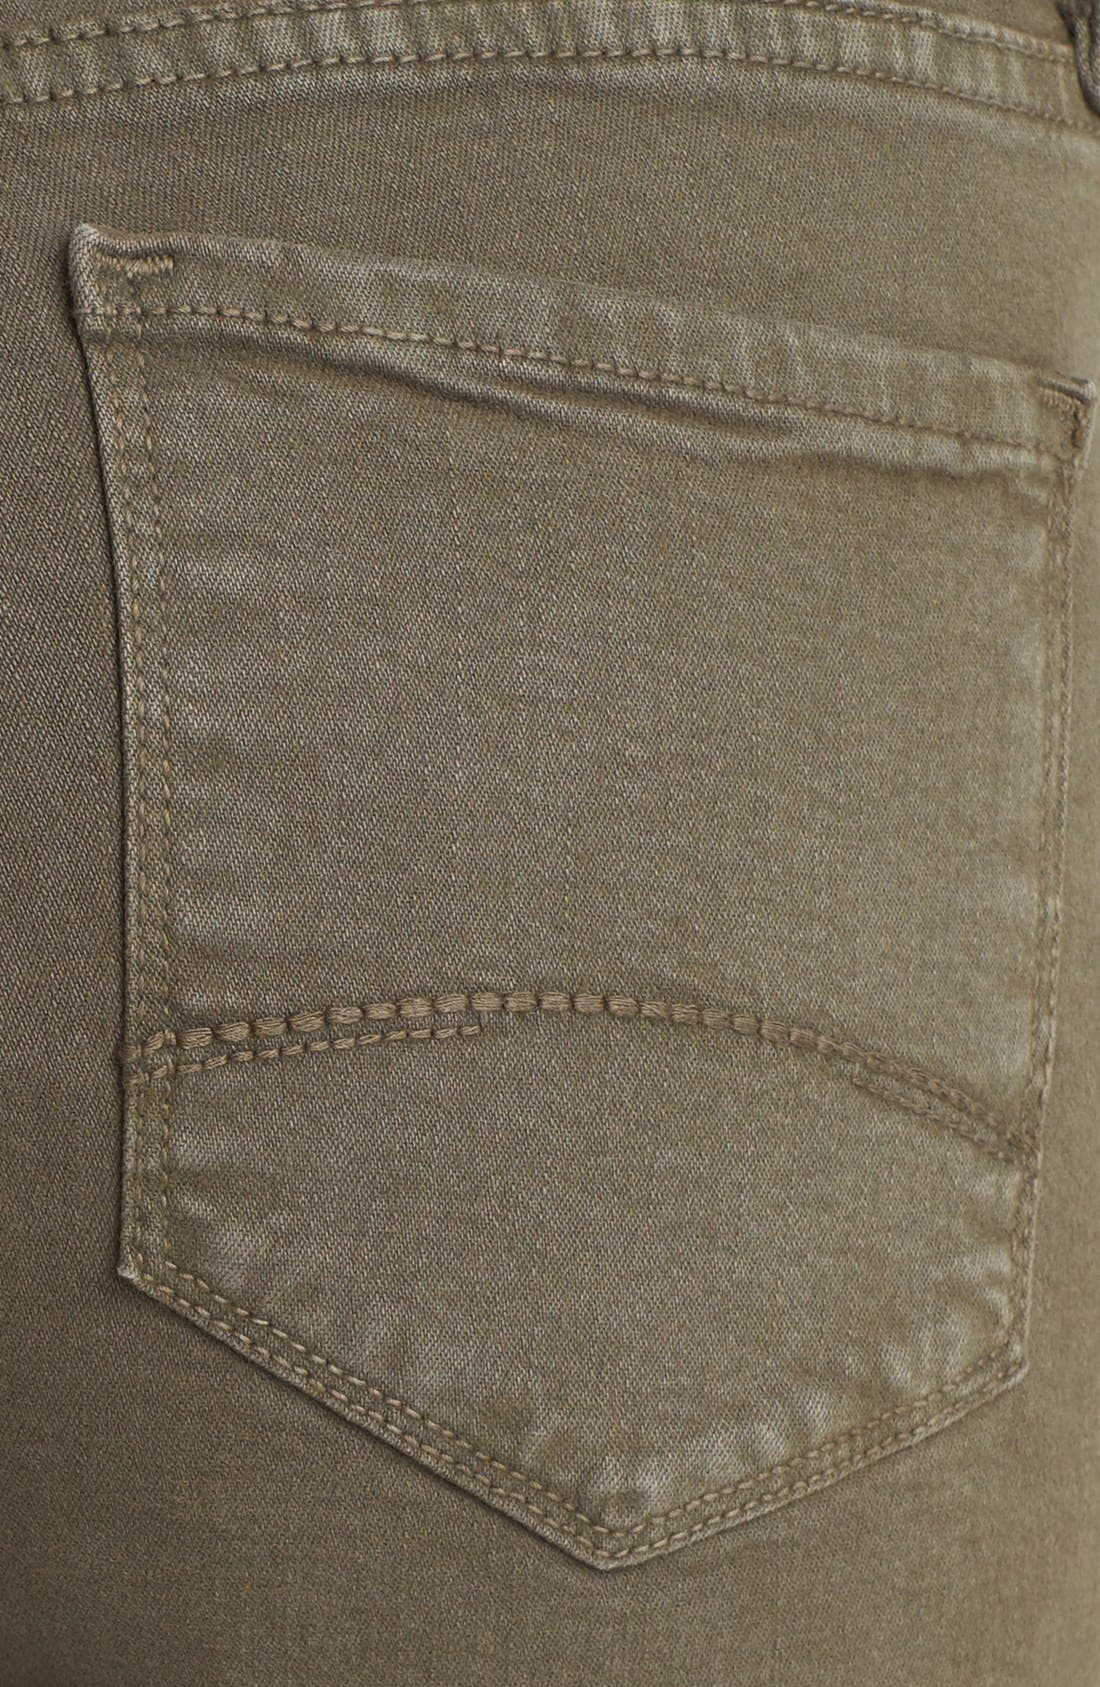 Alternate Image 3  - NYDJ 'Barbara' Colored Stretch Bootcut Jeans